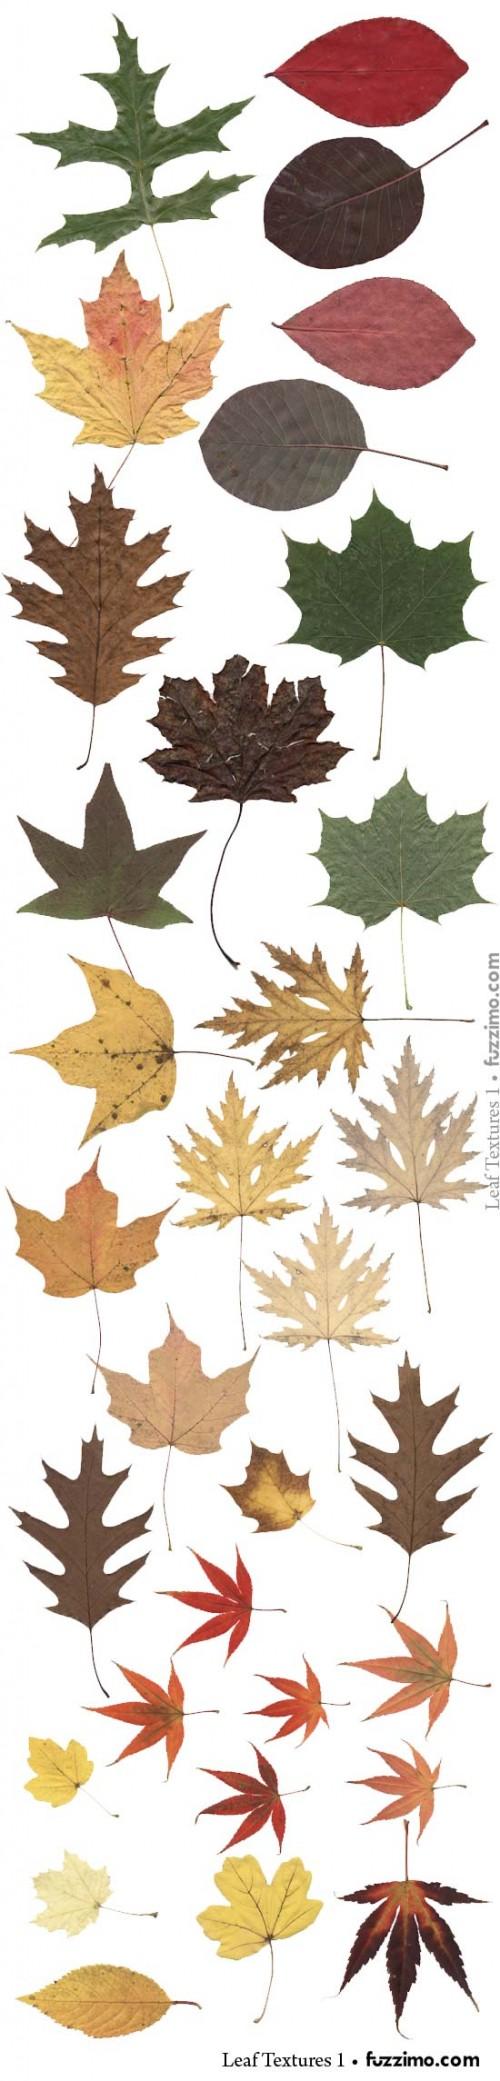 fzm-Leaf-Textures-02